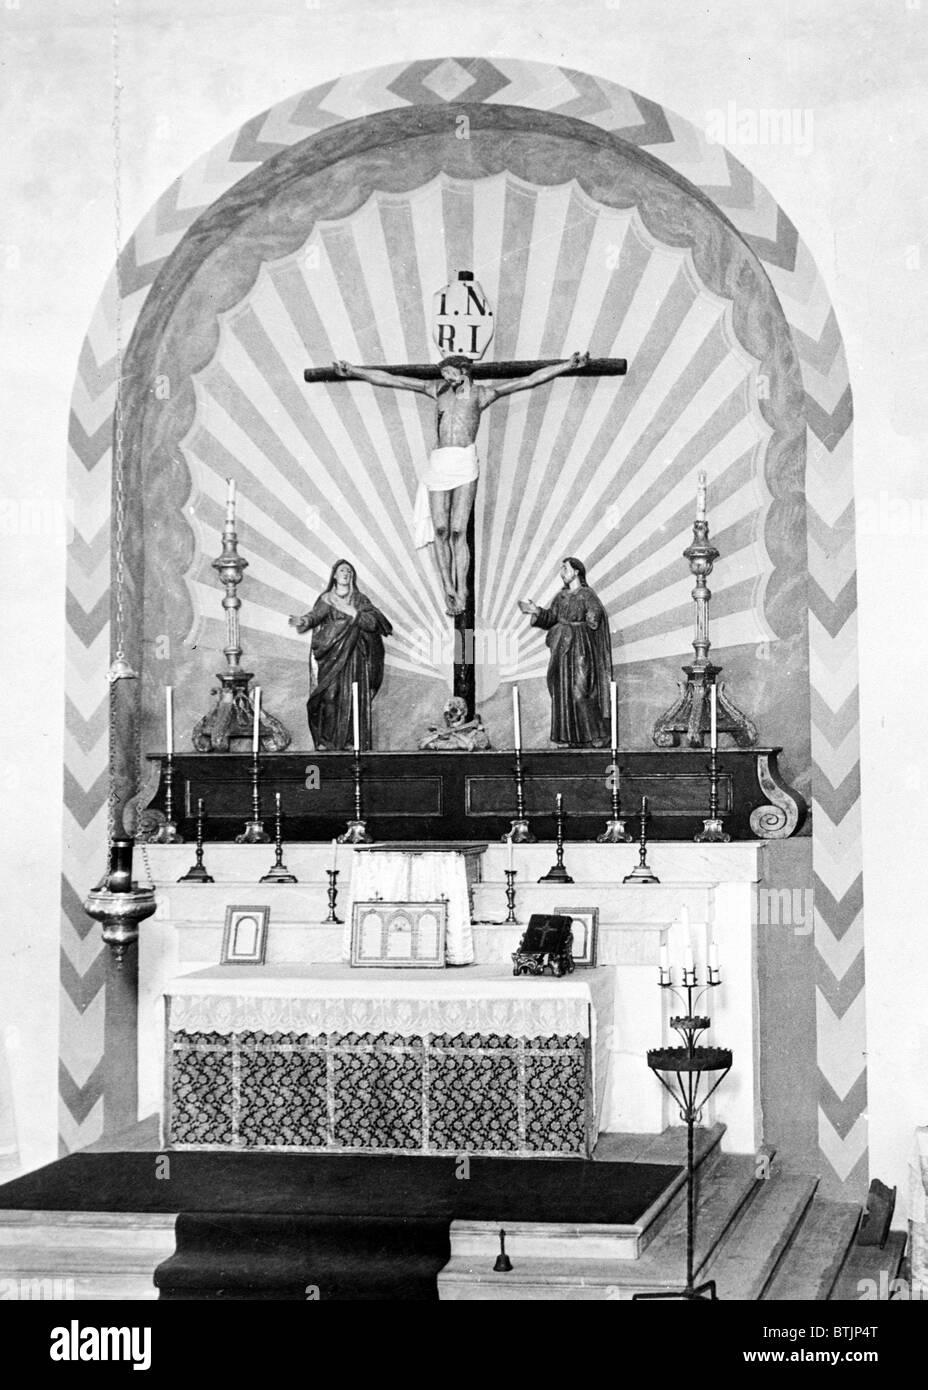 Religion, Mission San Carlos Borromeo, view of high altar, photograph by Robert W. Kerrigan, Rio Road, & Lausen - Stock Image